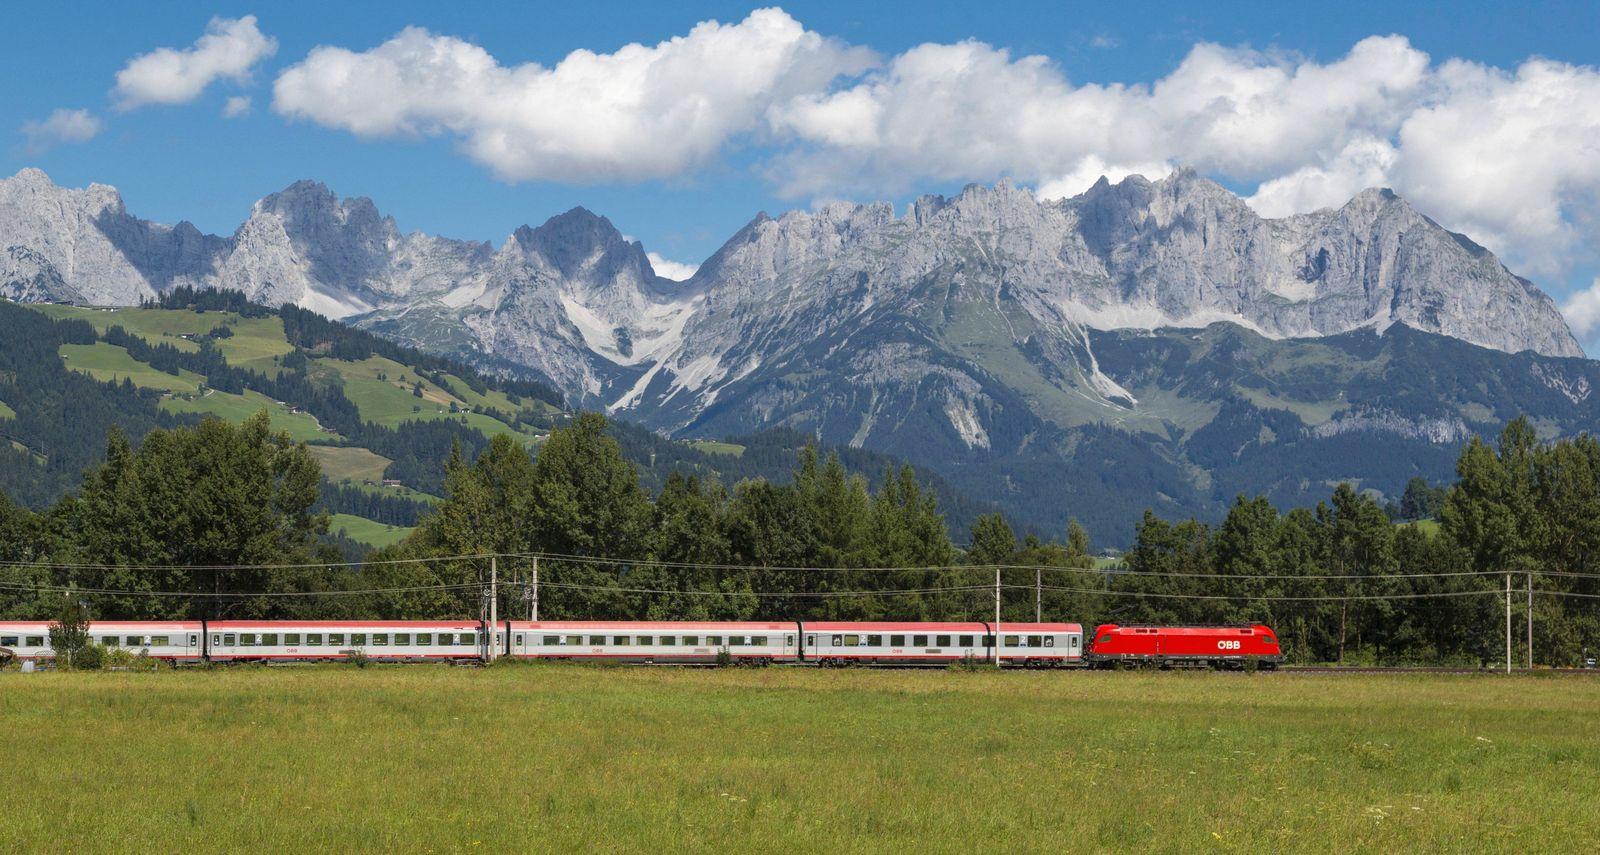 Zug bei Gundhabing Kitzbühel Tirol Österreich Train near Kitzbühel Tyrol Austria BLWX047424 Co